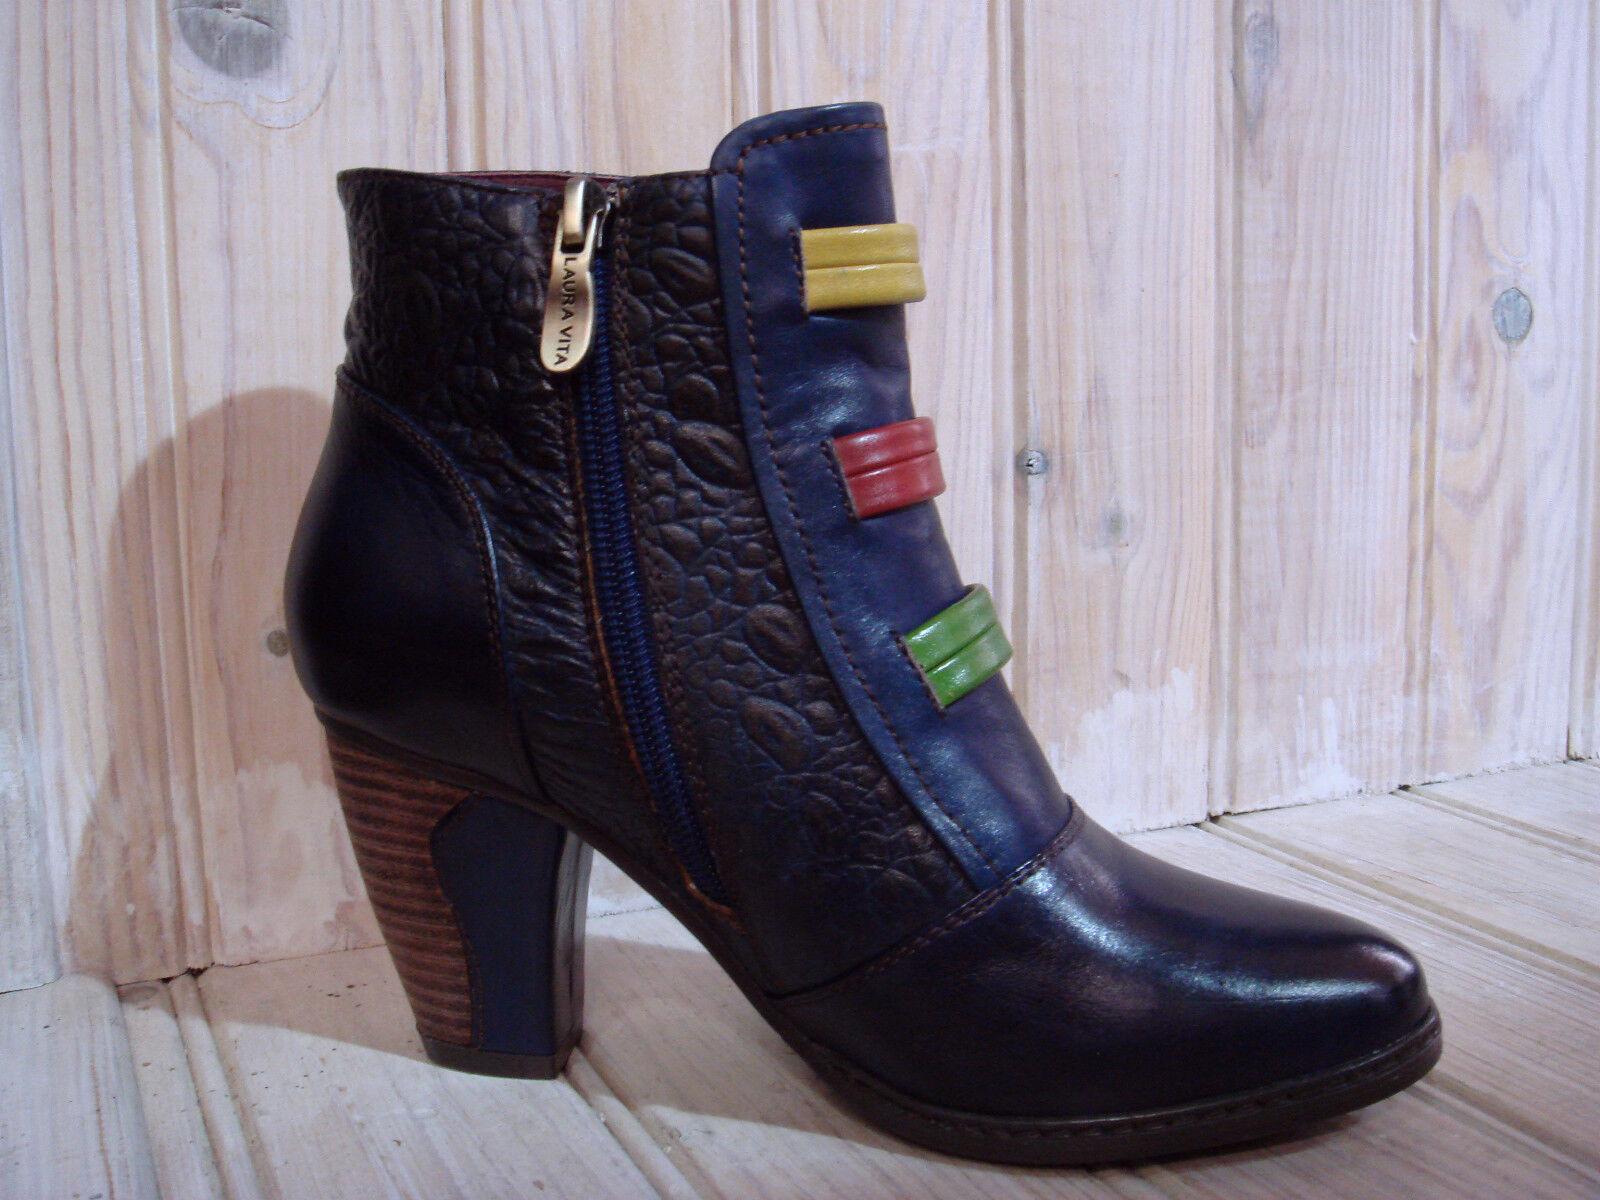 LAURA VITA bottine femme réf CX2618-3 AMELIE 03 bleu P37  neuves 2016